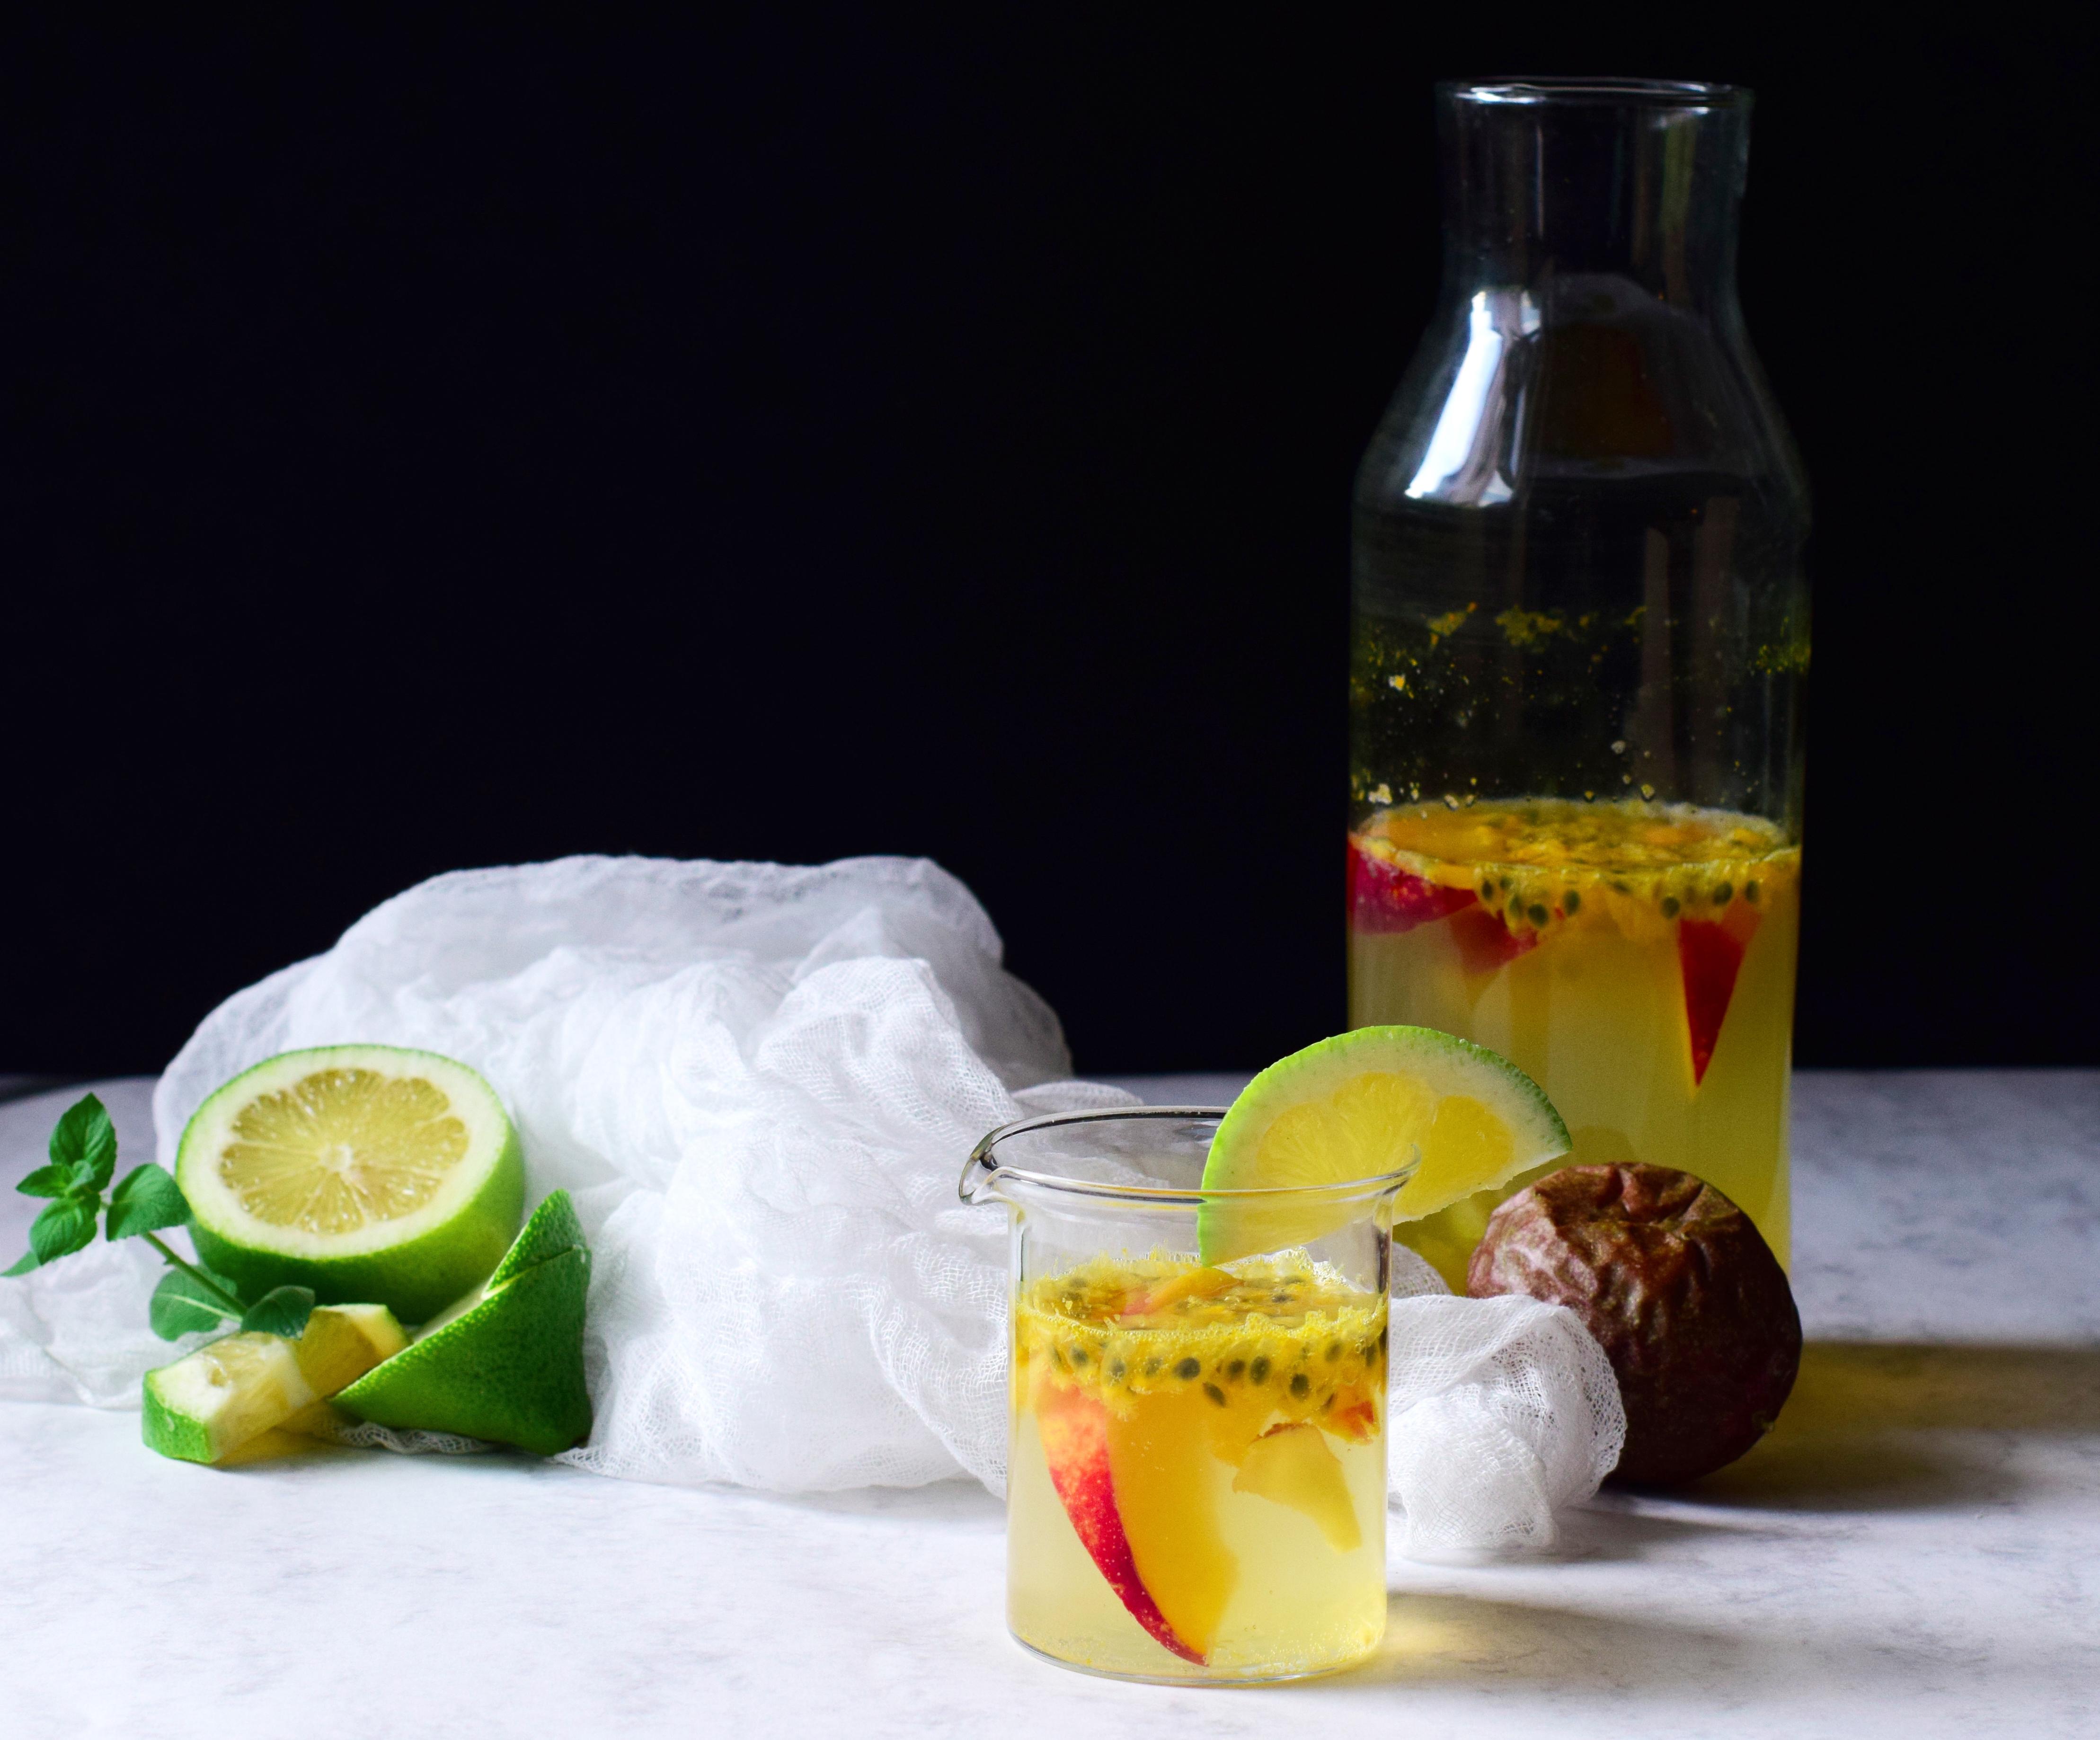 limonade legere fruit passion maracuja nectarine gingembre groseille maquereaux